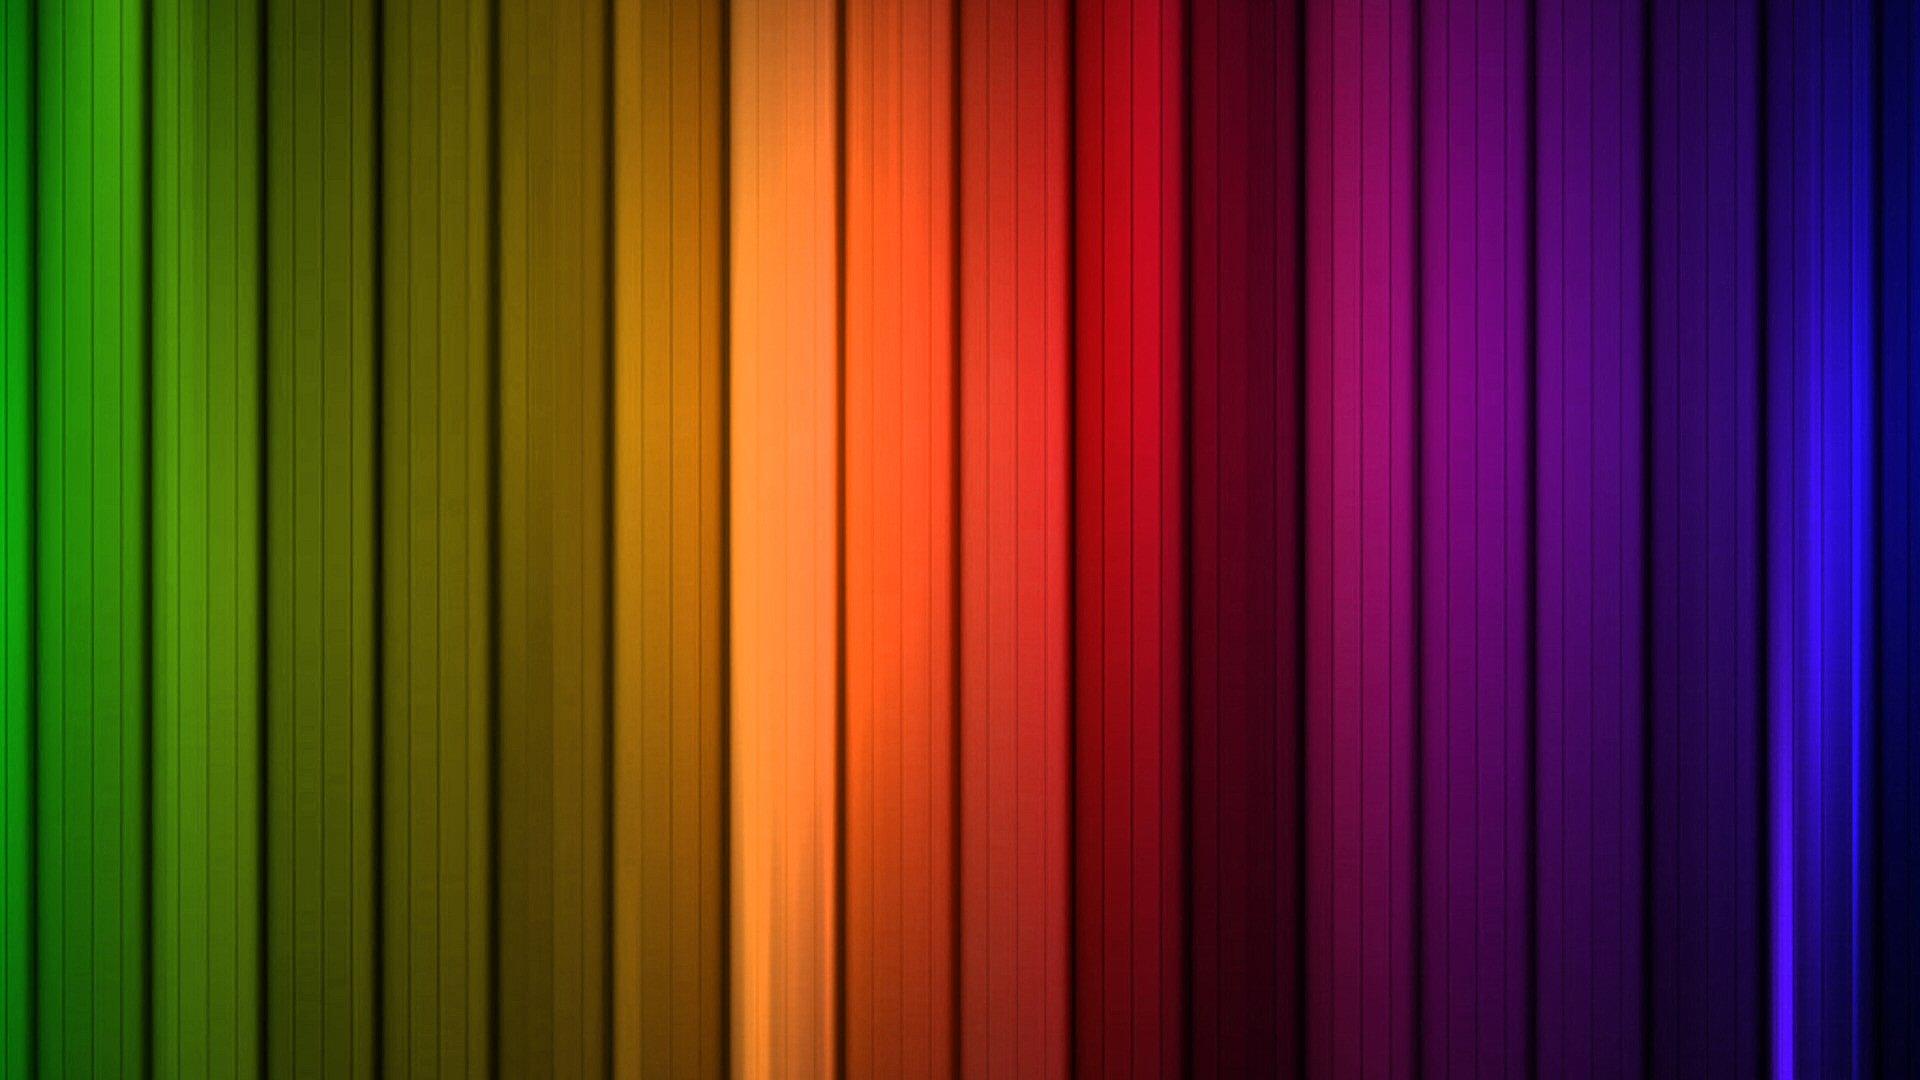 Hd wallpaper rainbow - 14 Fantastic Hd Rainbow Wallpapers